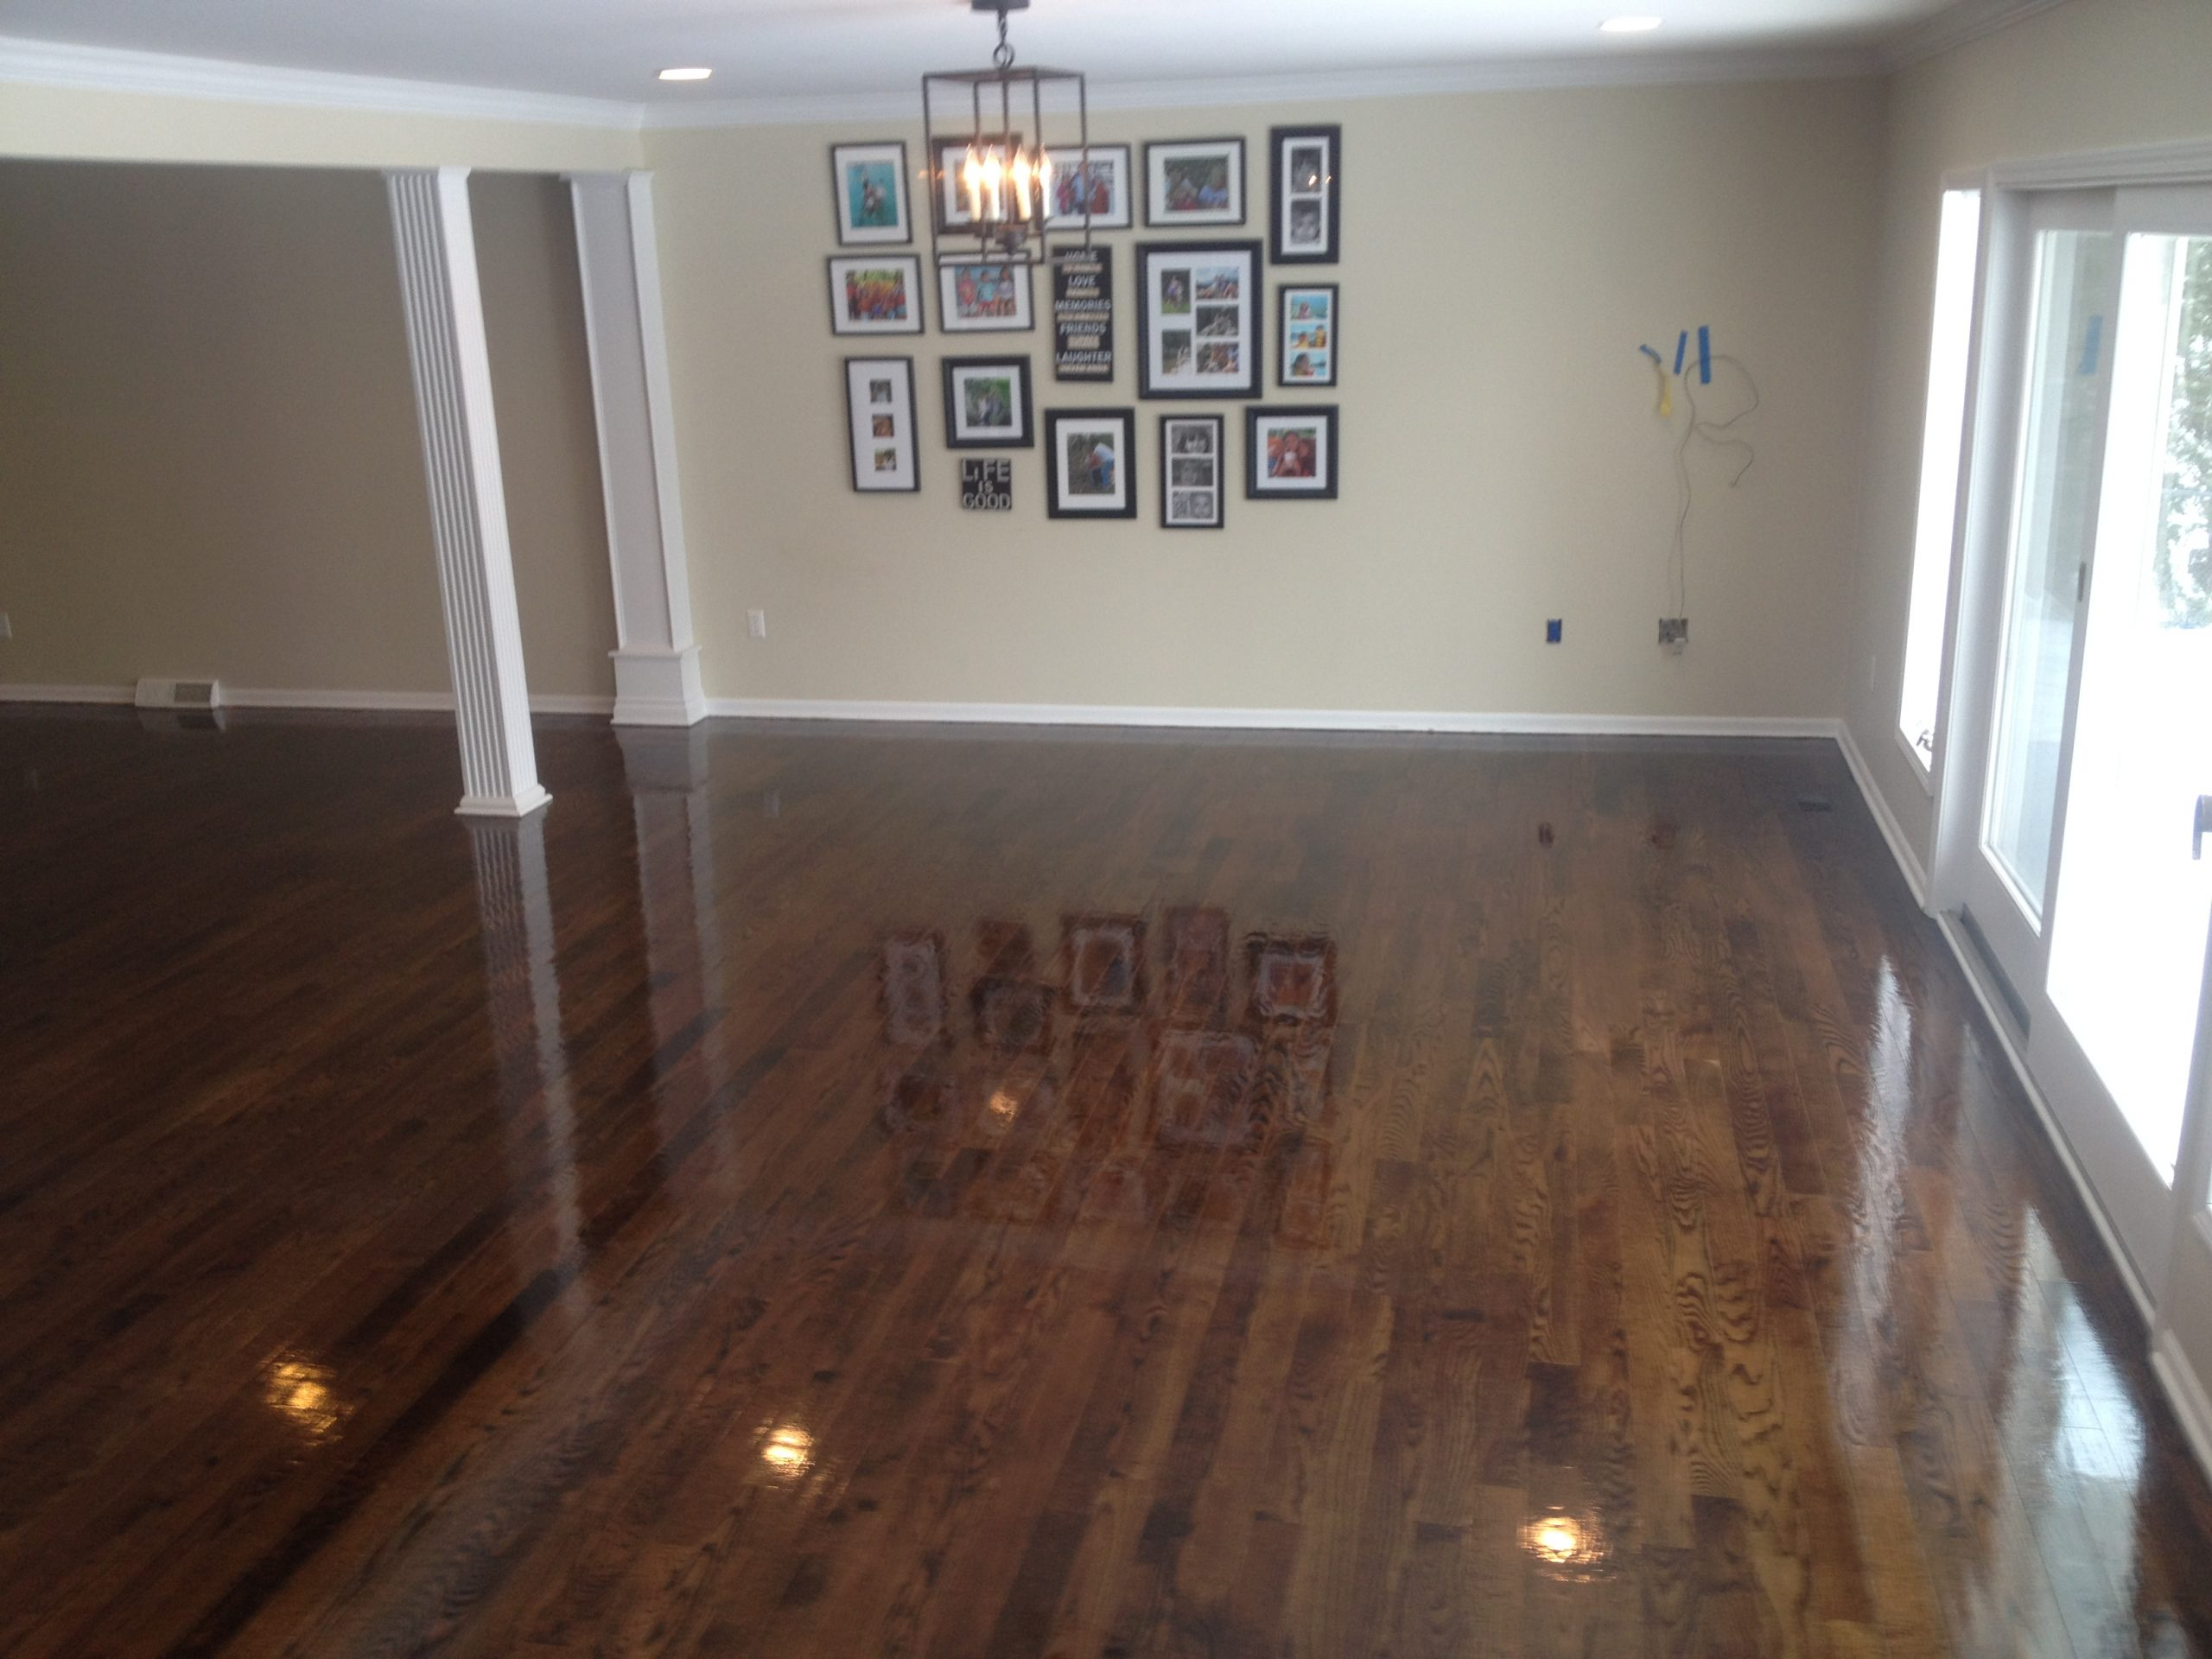 Hardwood floor refinished in Oakland County